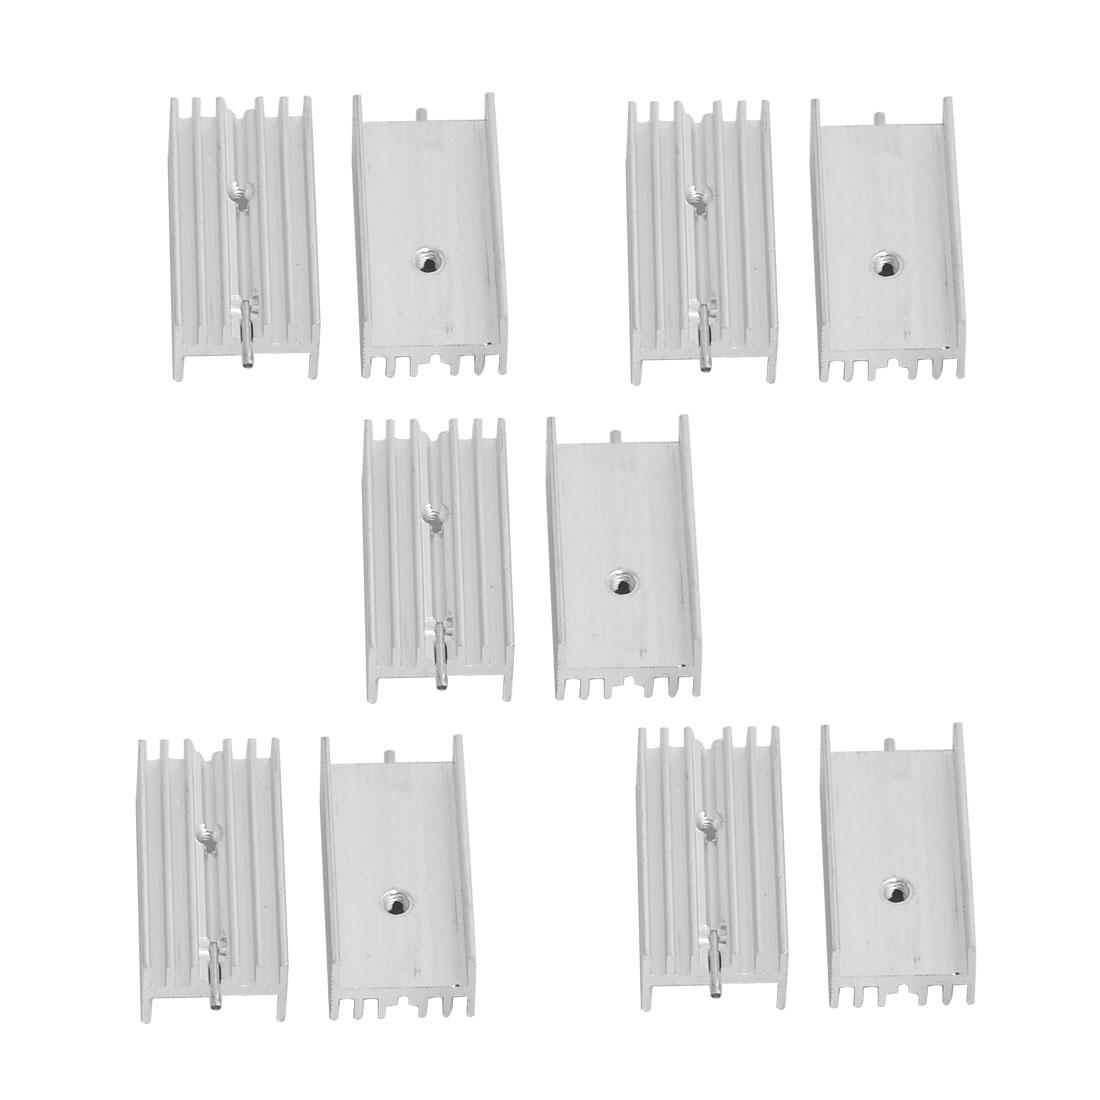 Aluminium Heatsink Cooling Fin Cooler Silver Tone 15mm x 30mm x 10mm 10 Pcs